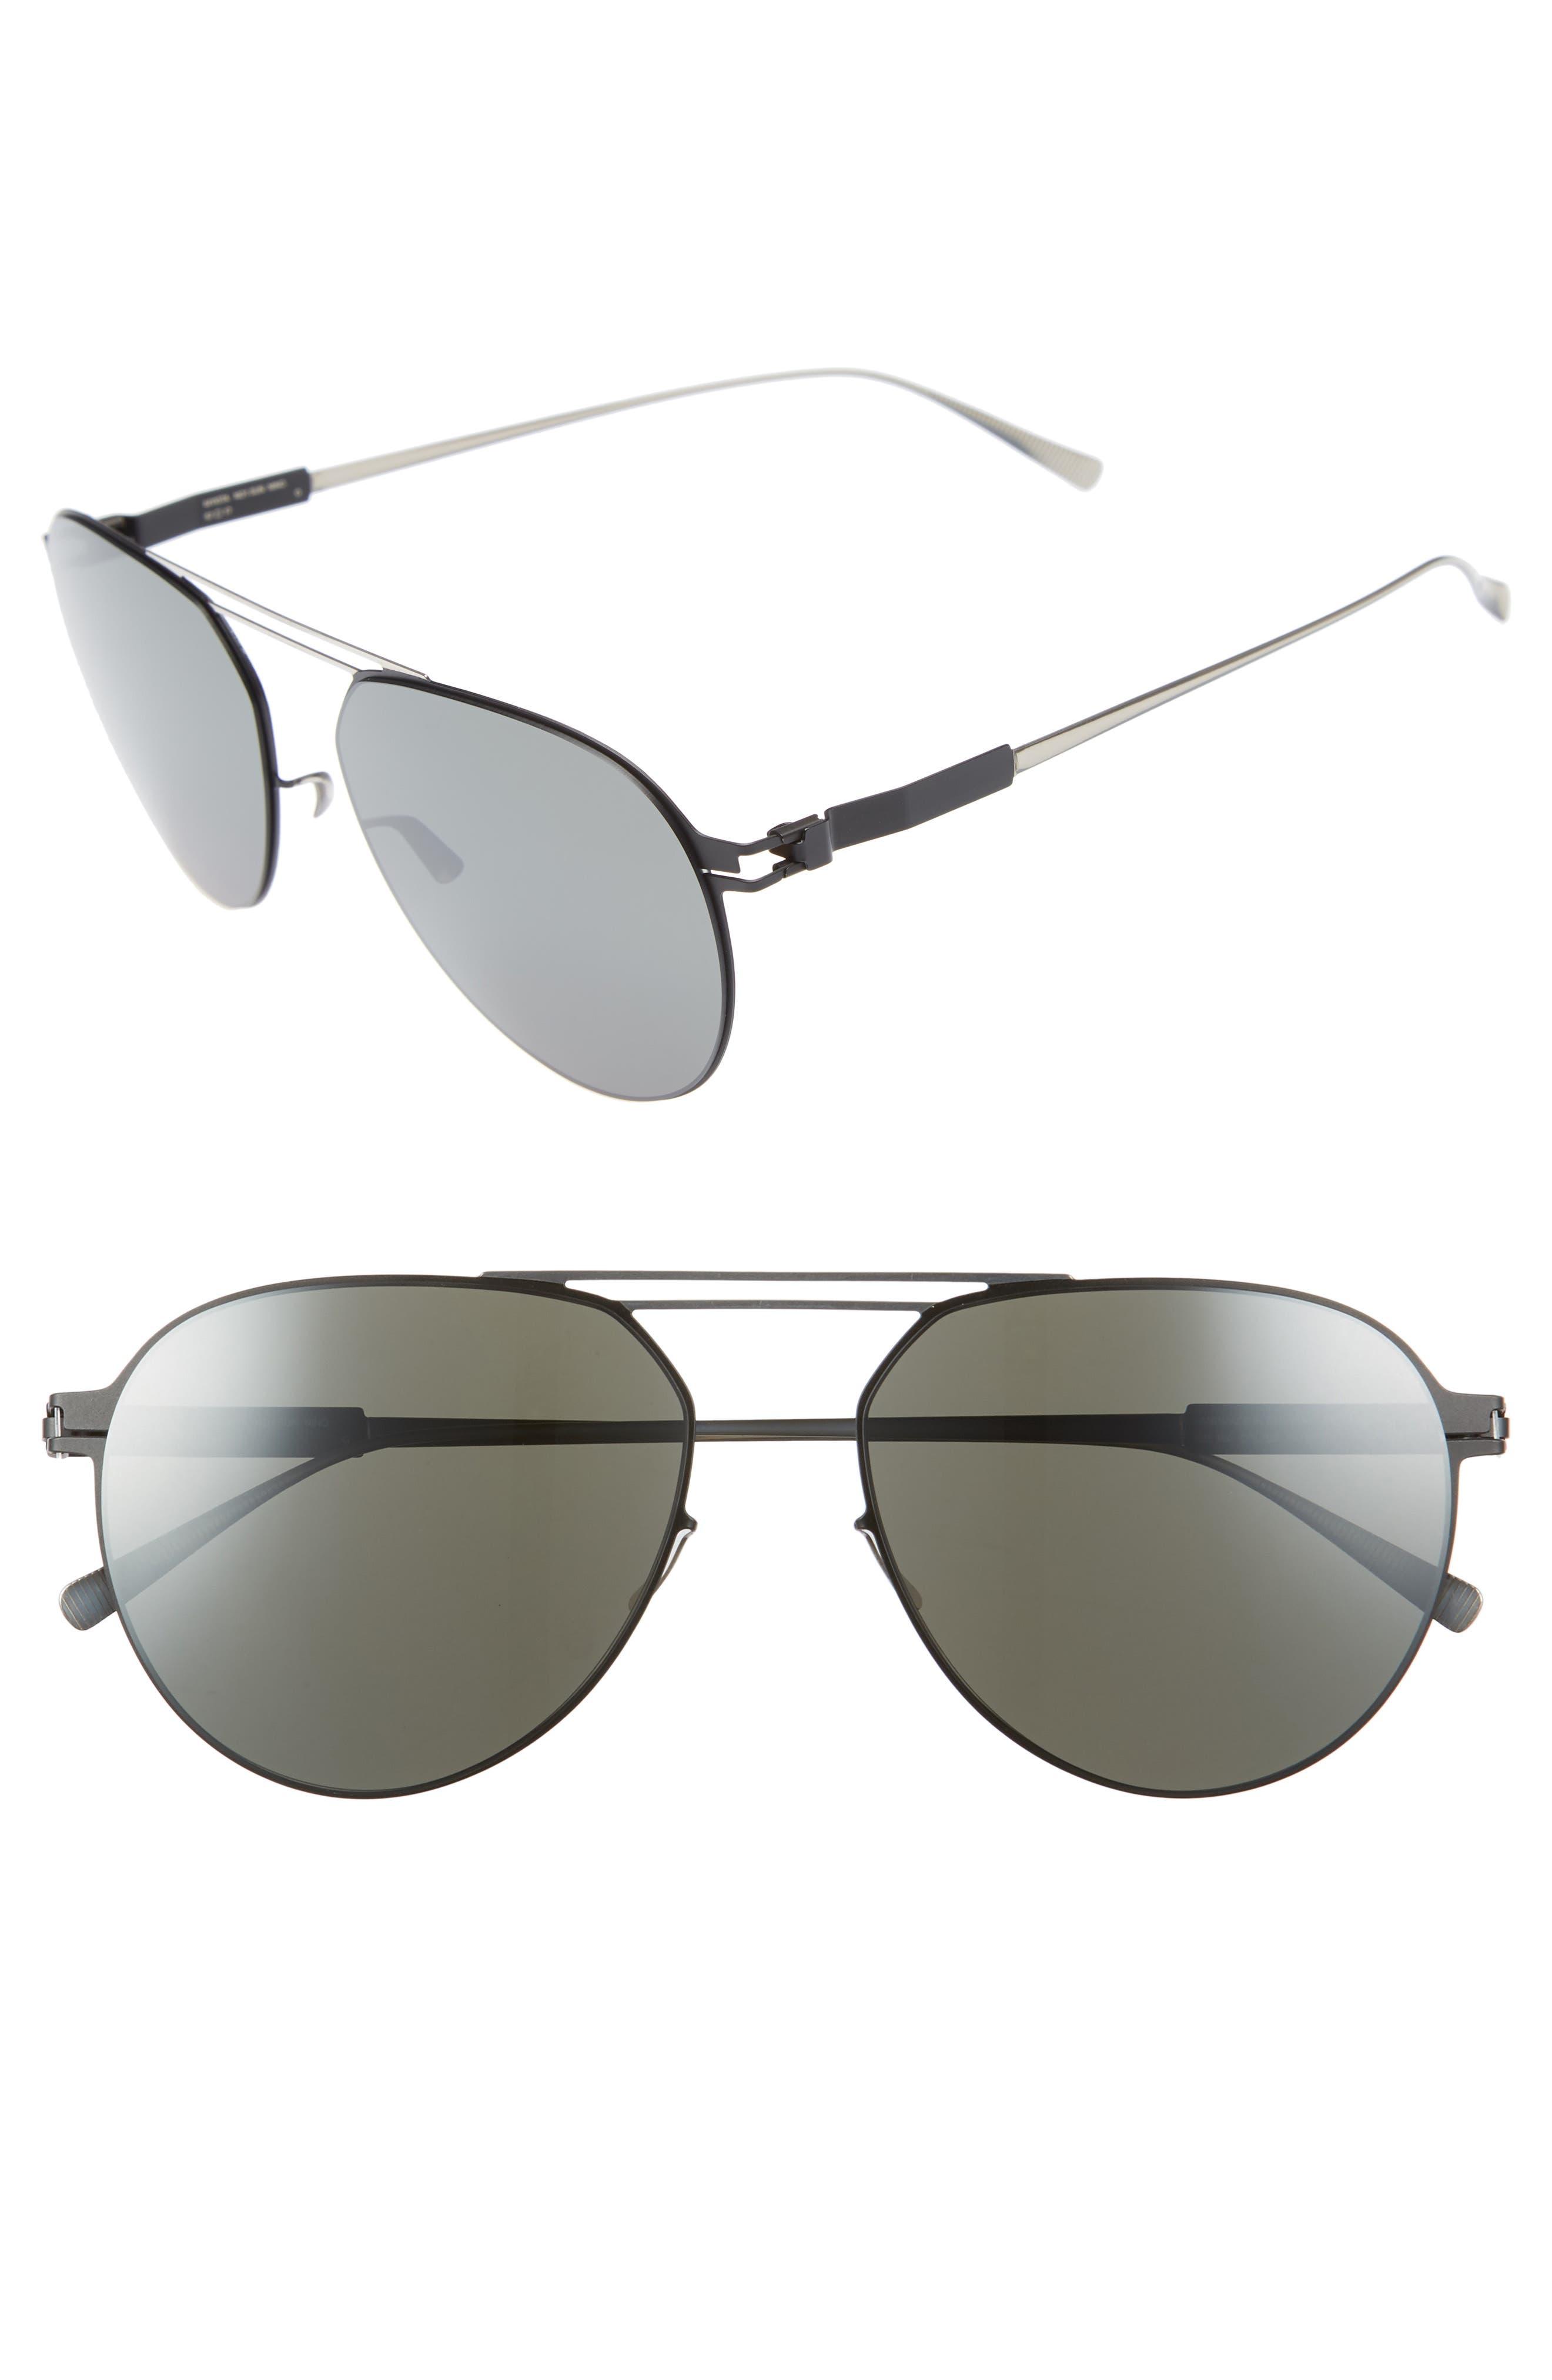 Nino 57mm Aviator Sunglasses,                             Main thumbnail 1, color,                             042